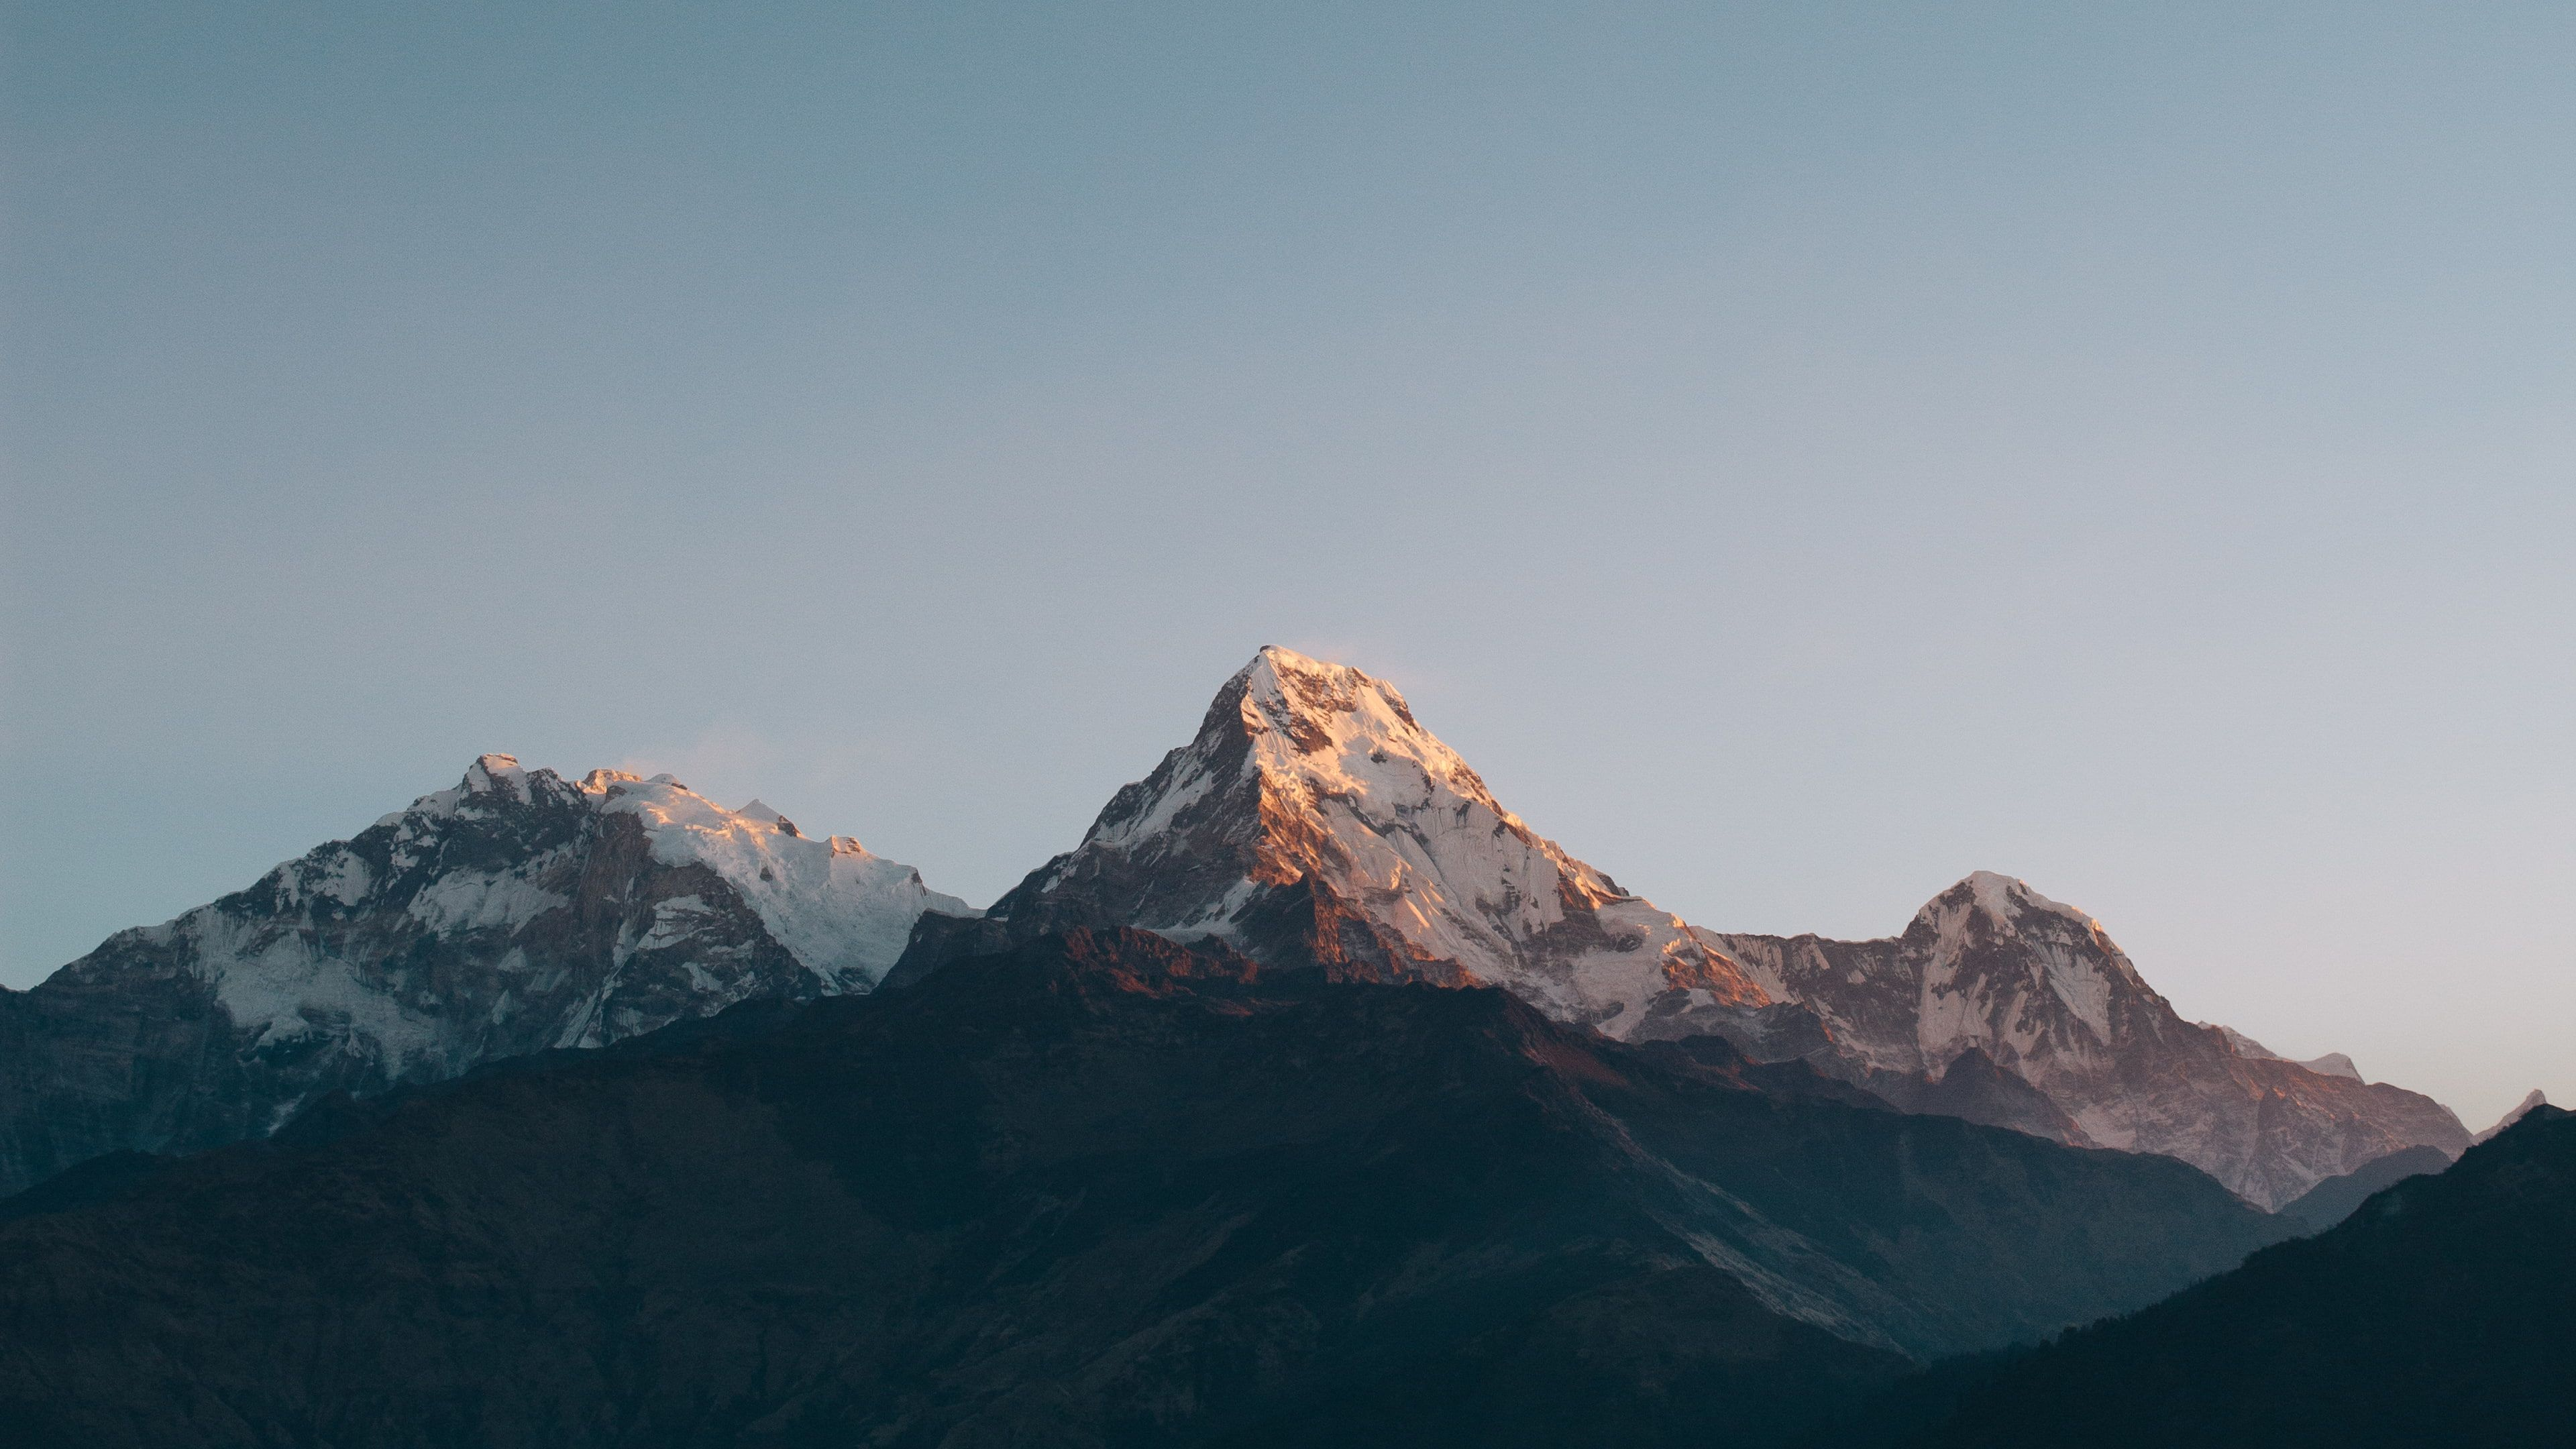 Sunrise Annapurna Massif Himalayas Minimal Mountains 4k Nepal 4k Wallpaper Hdwallpaper Minimal Desktop Wallpaper Minimal Wallpaper Sunrise Wallpaper